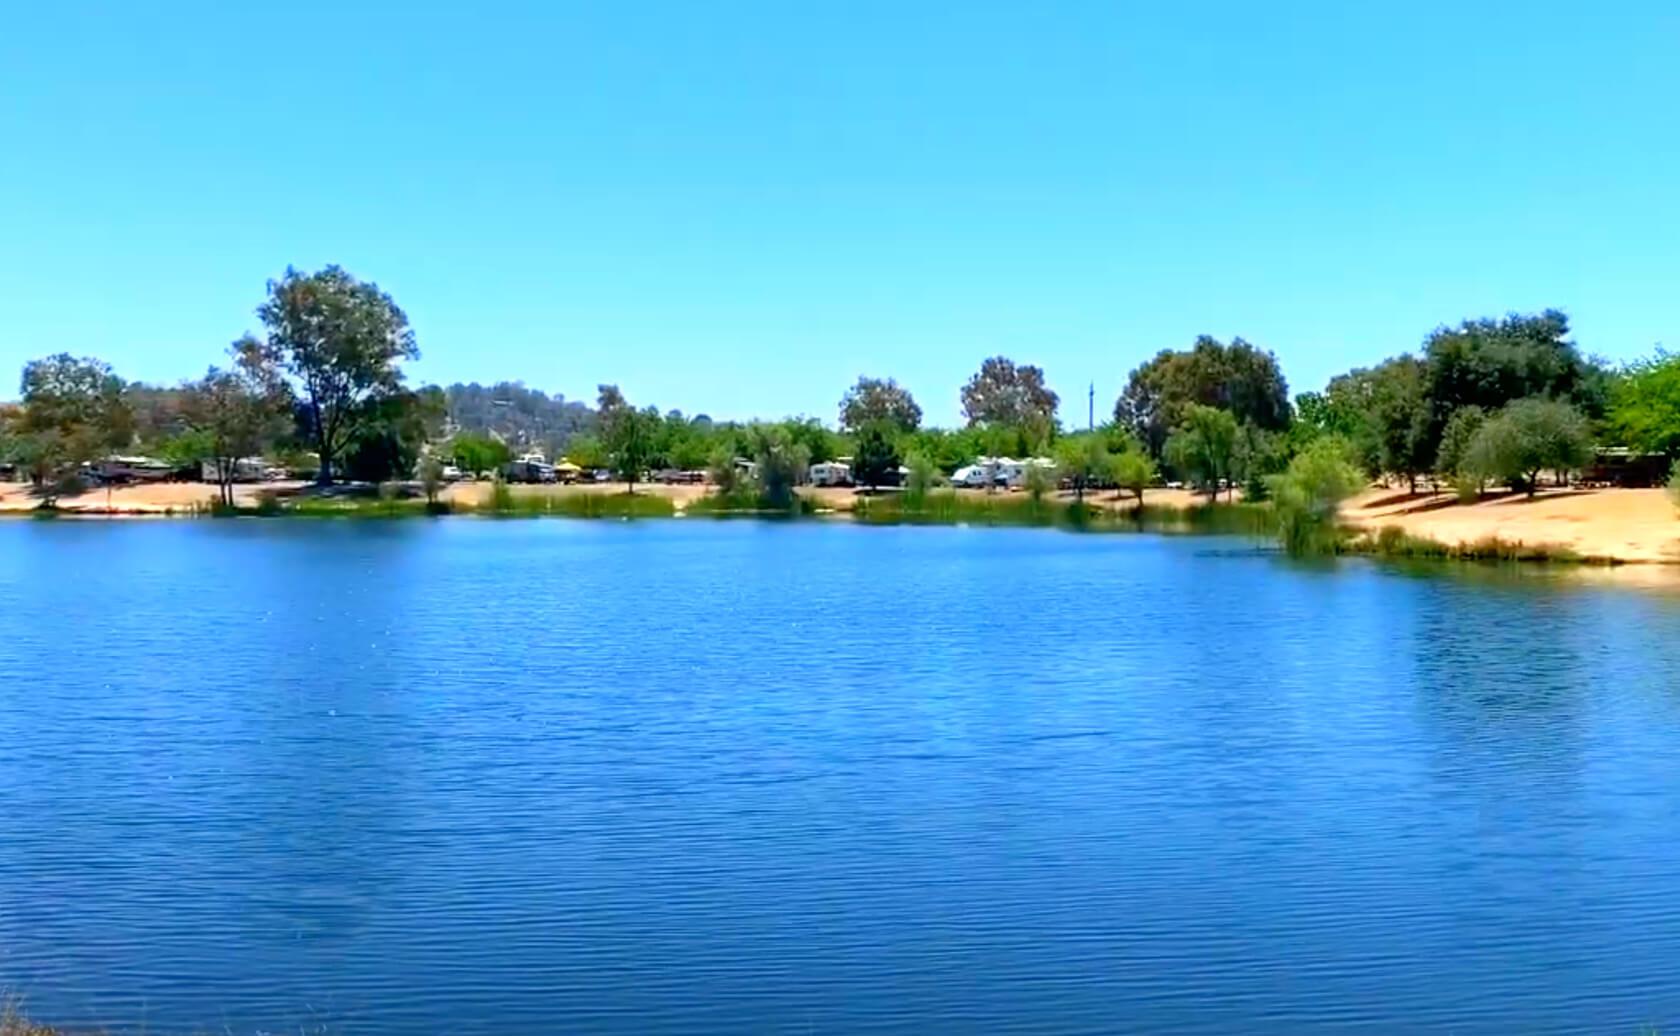 Camanche-Lake-Reservoir-Fishing-Guide-Report-California-04